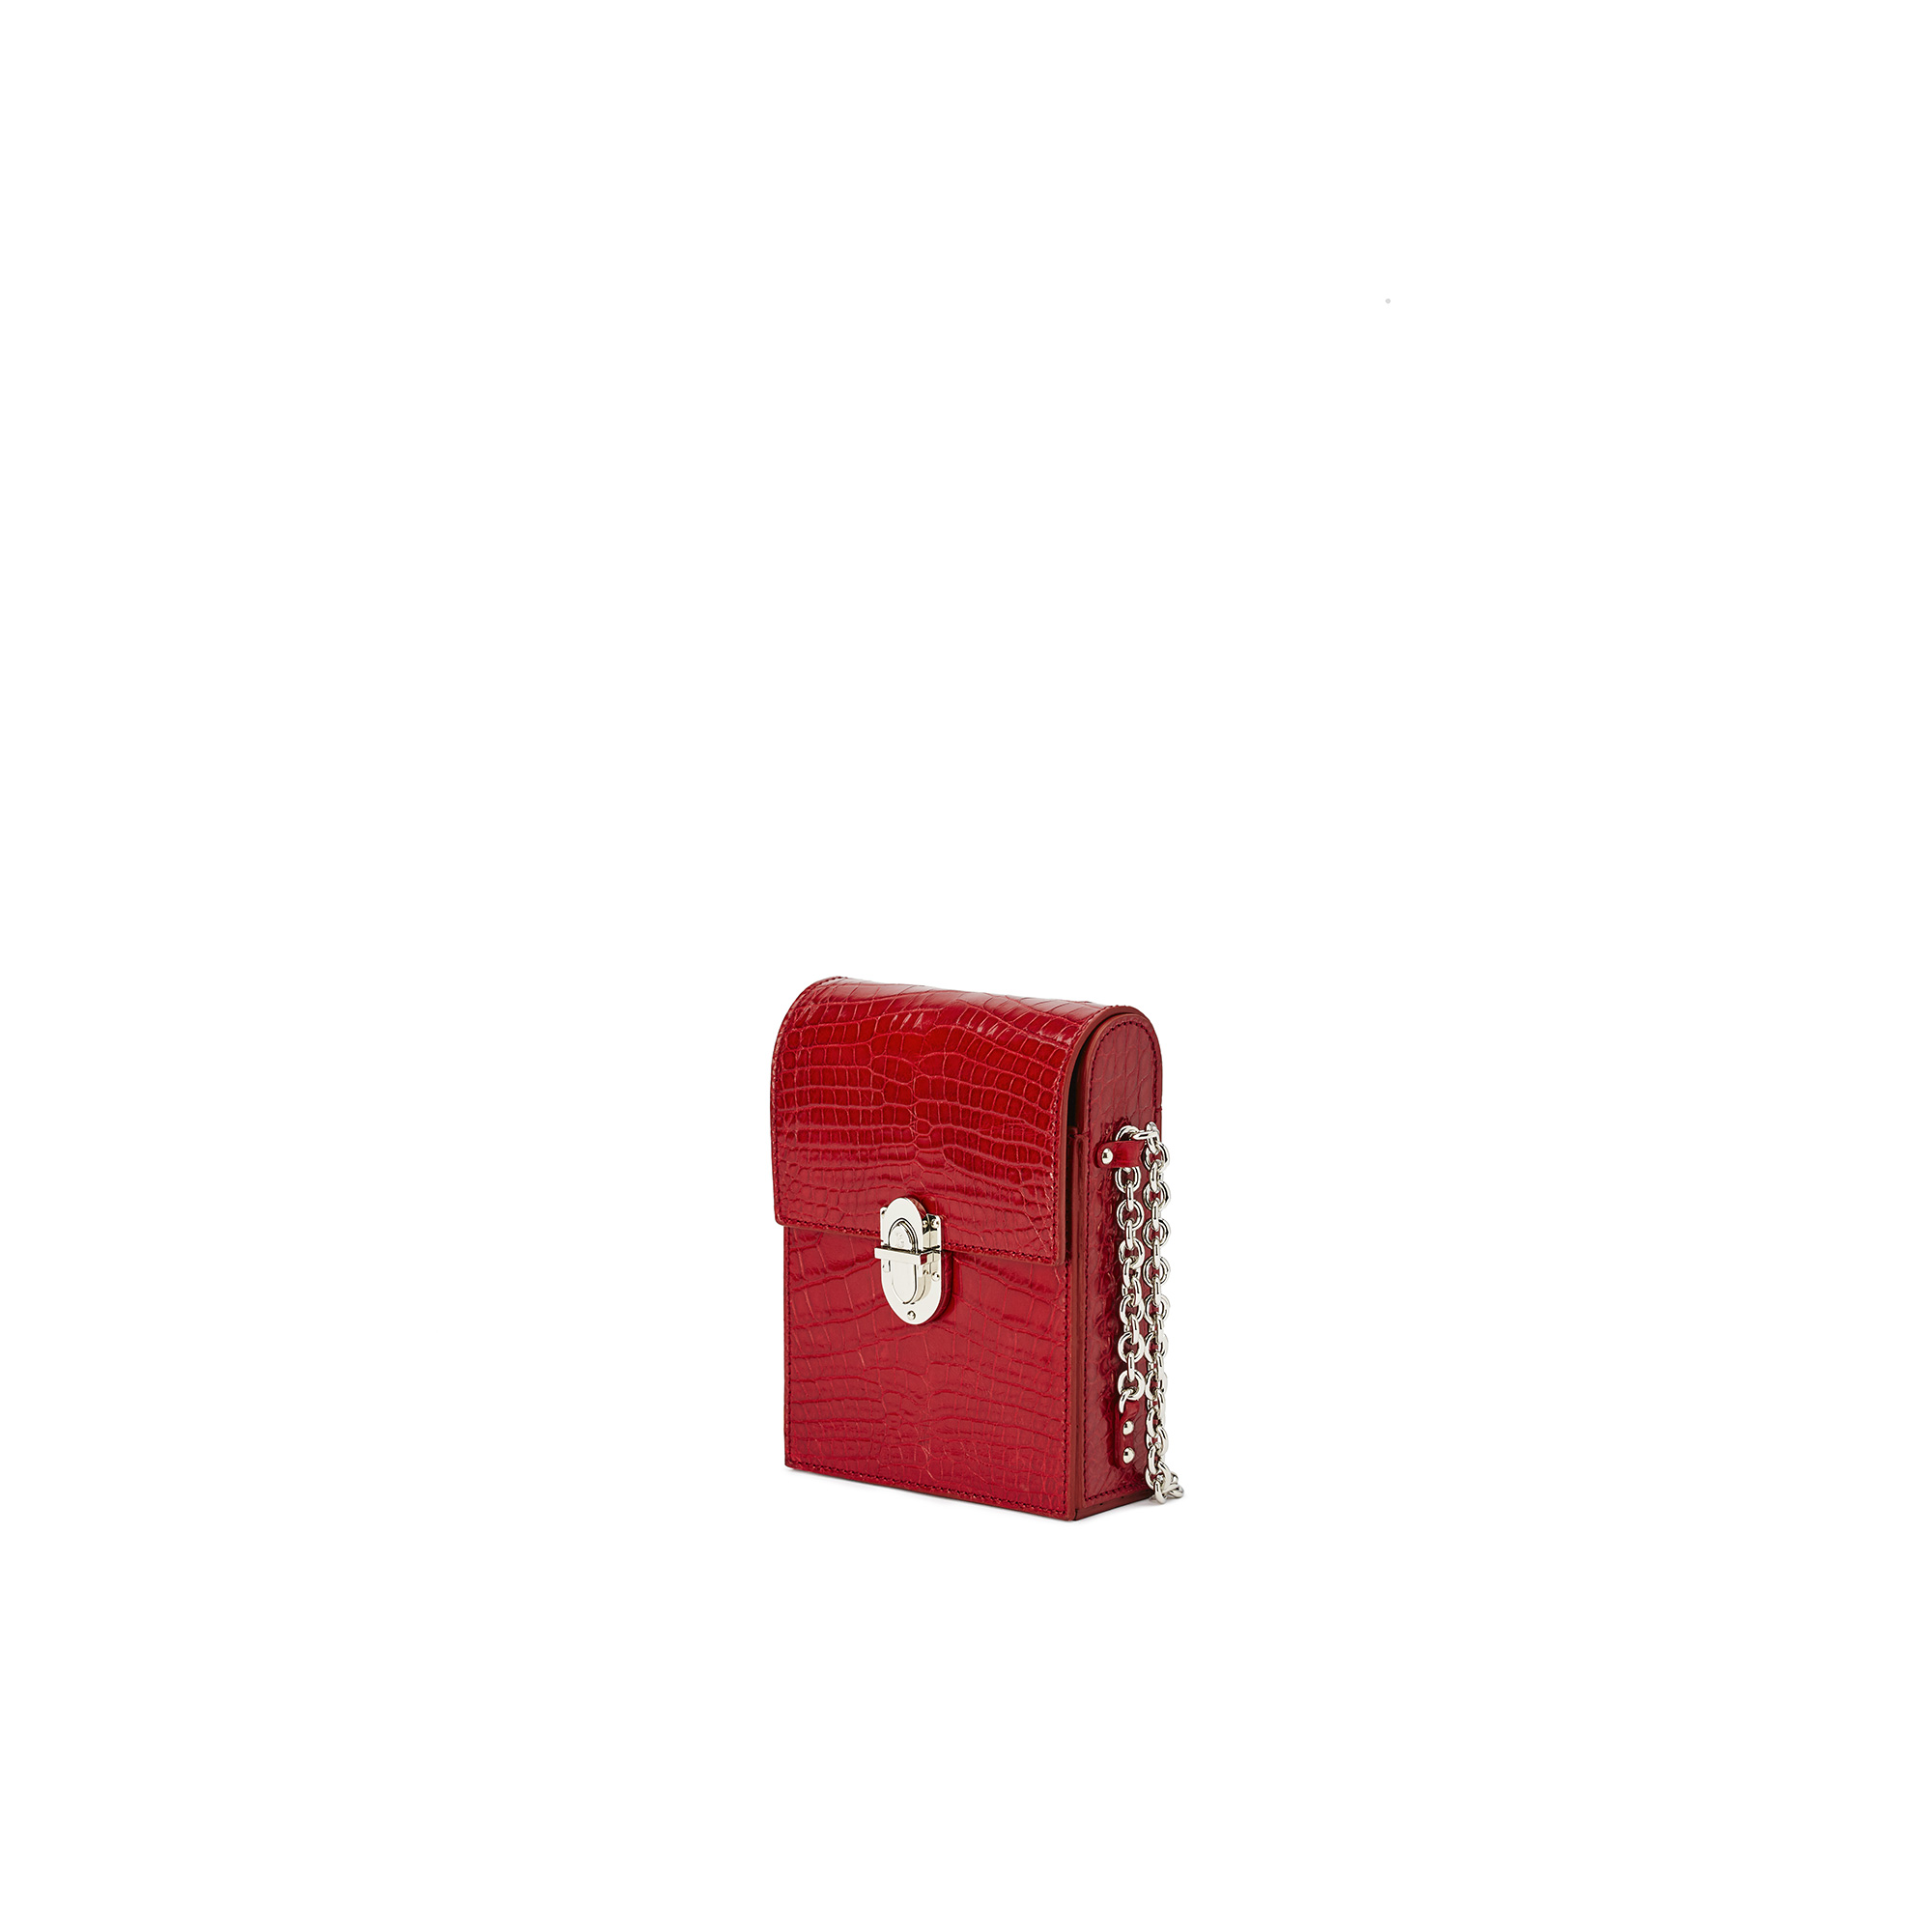 Mini-Gigi-cherry-red-alligator-bag-Bertoni-1949_01